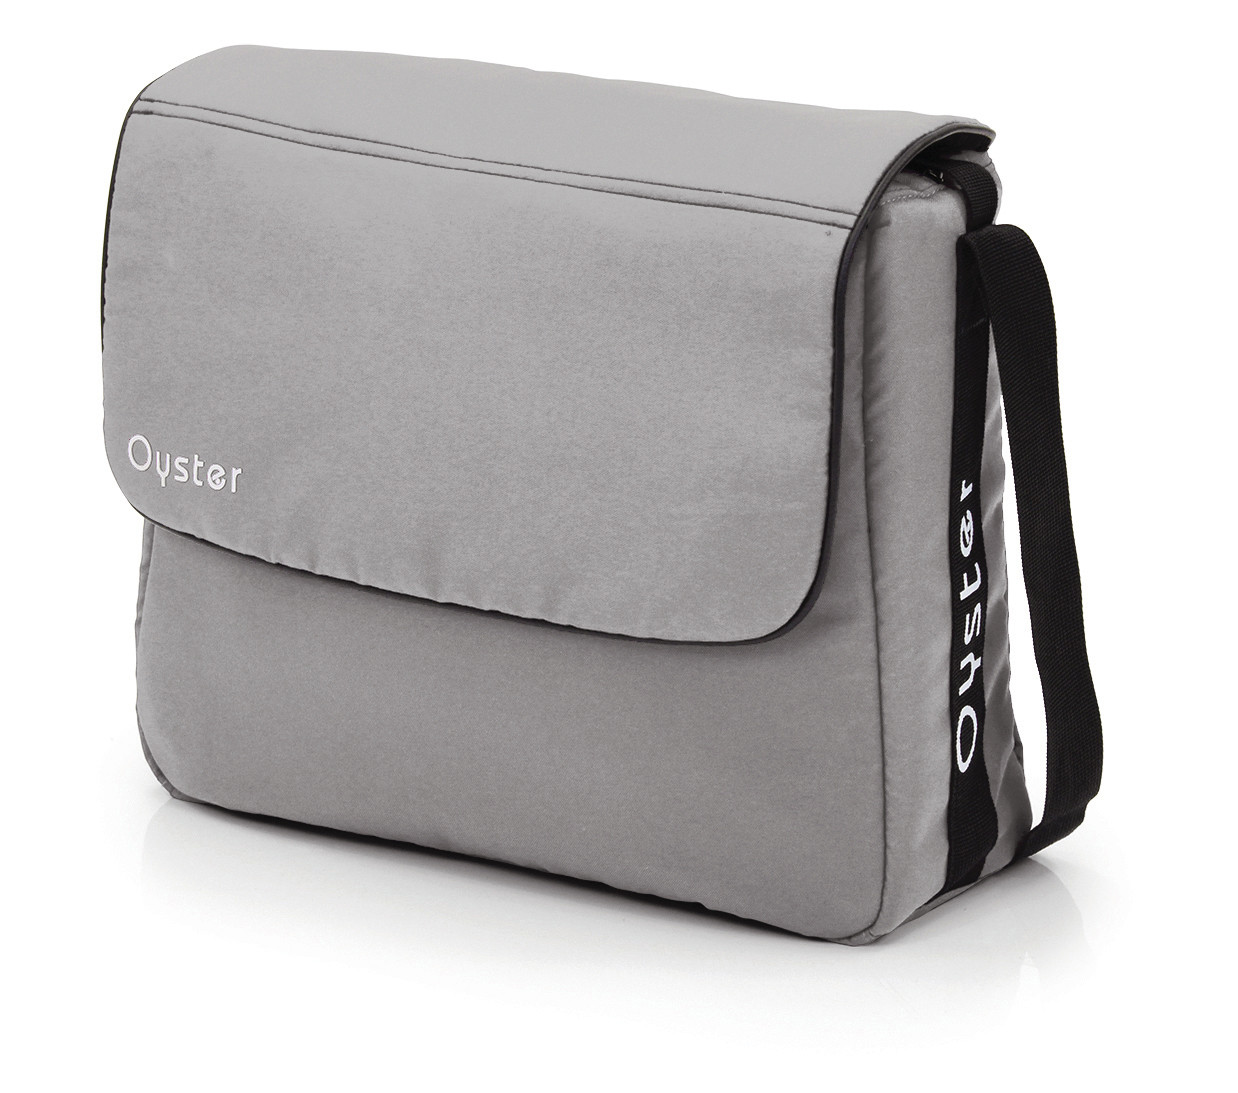 Аксессуар к коляске «BabyStyle» (OCBSIM) сумка Oyster, цвет Silver Mist